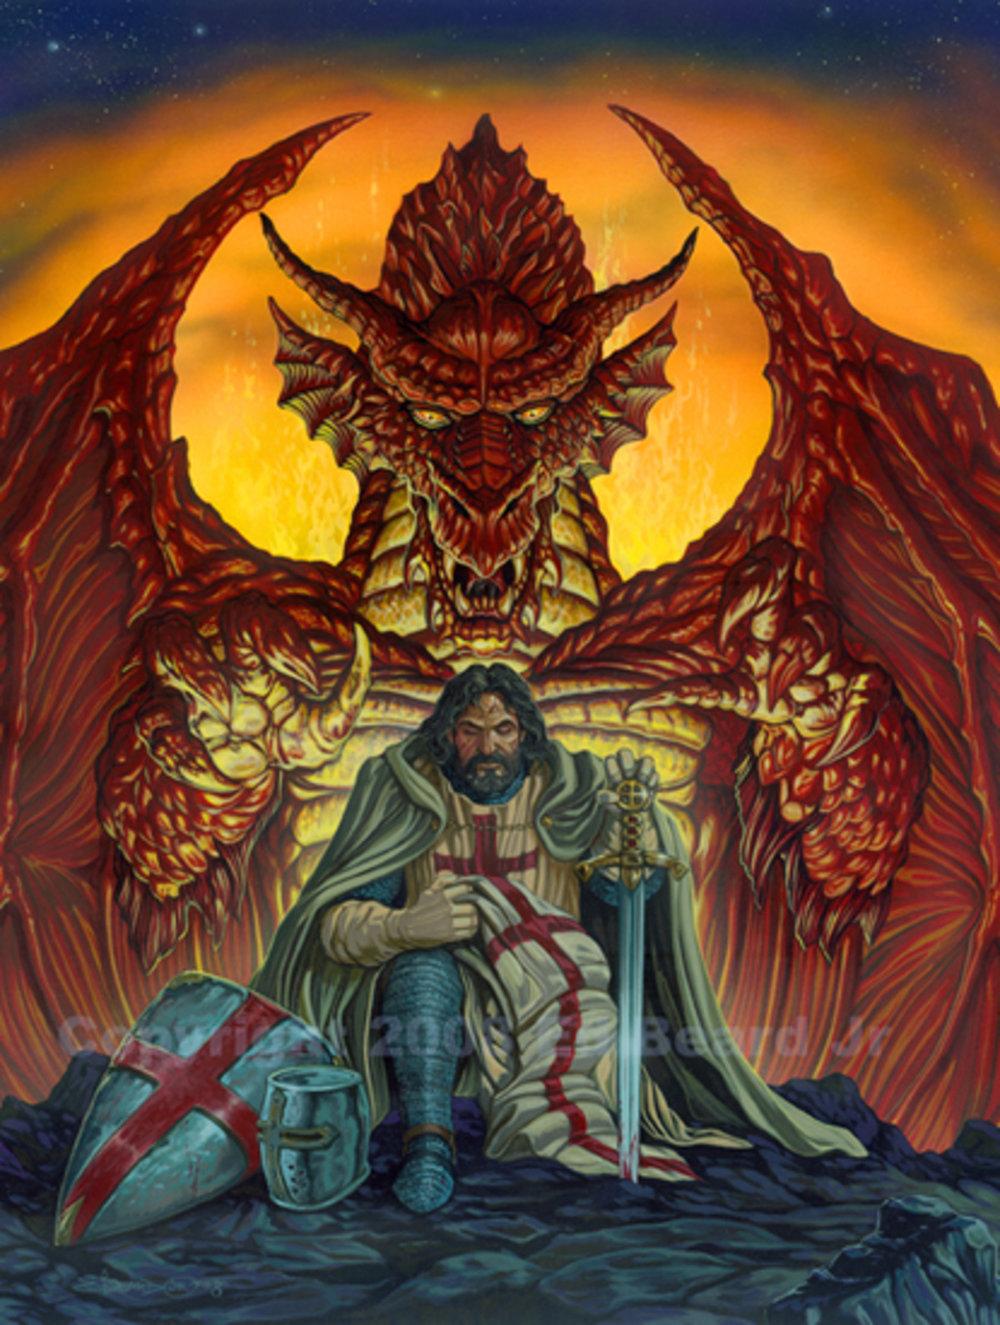 Templar's Bane